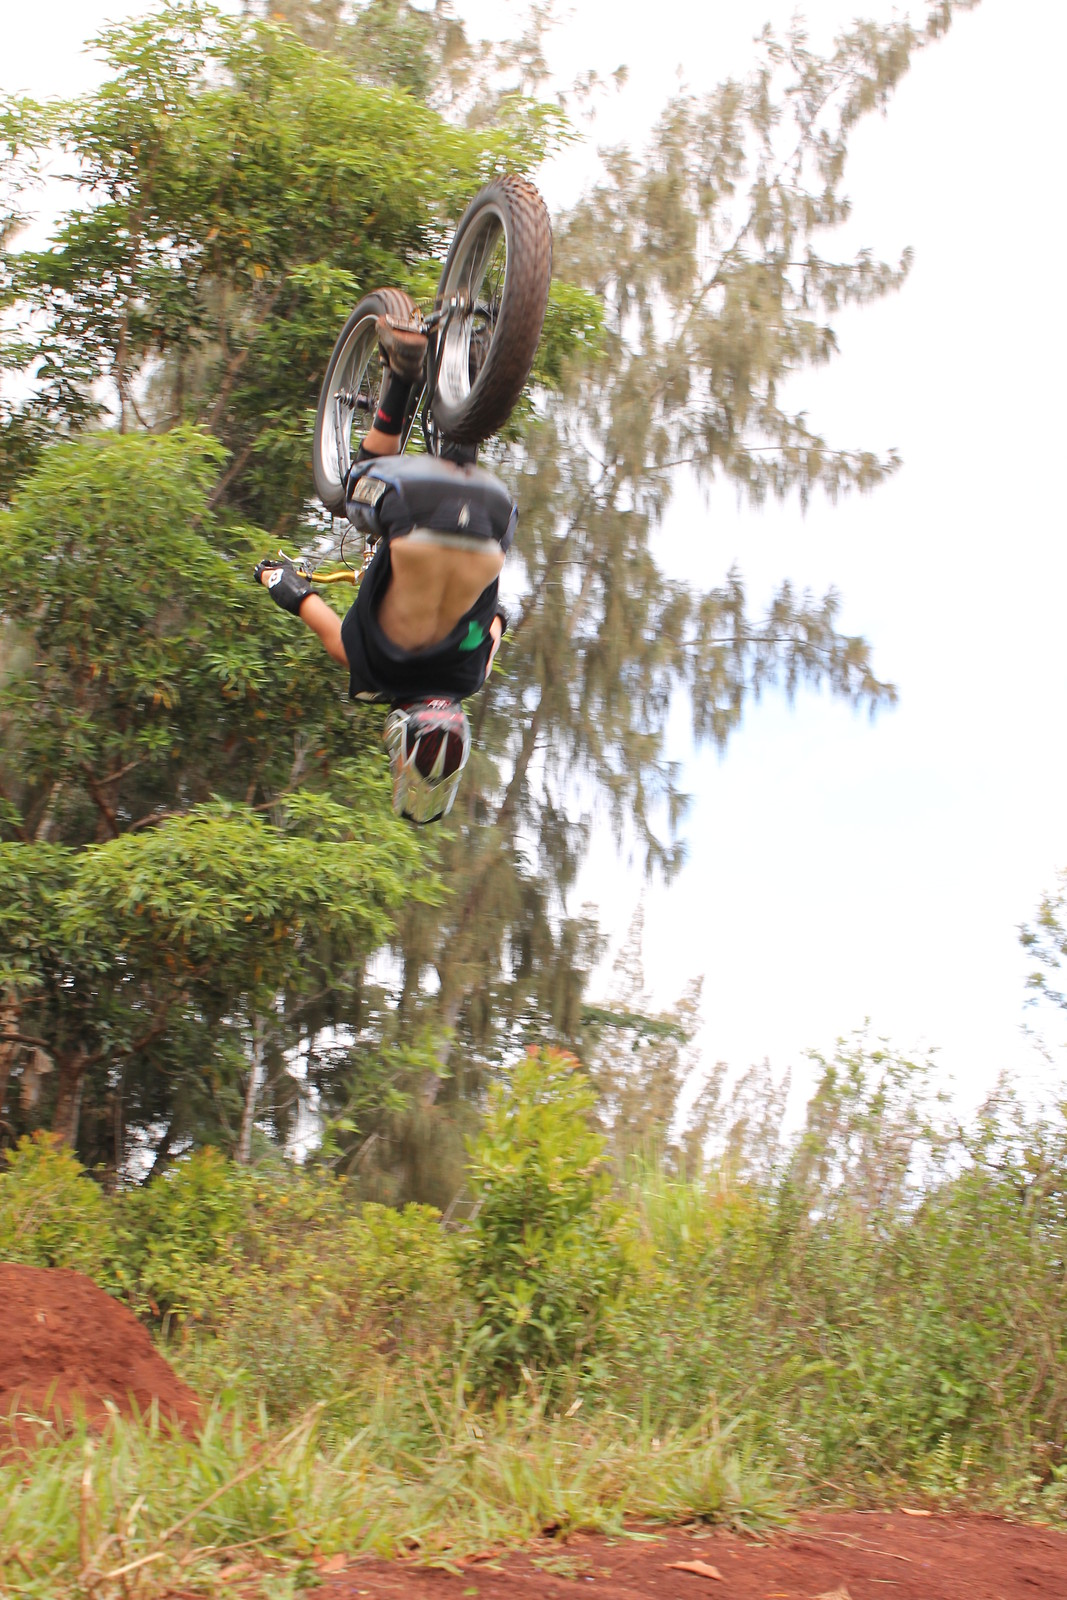 IMG 0473 - glenn.gamponia - Mountain Biking Pictures - Vital MTB